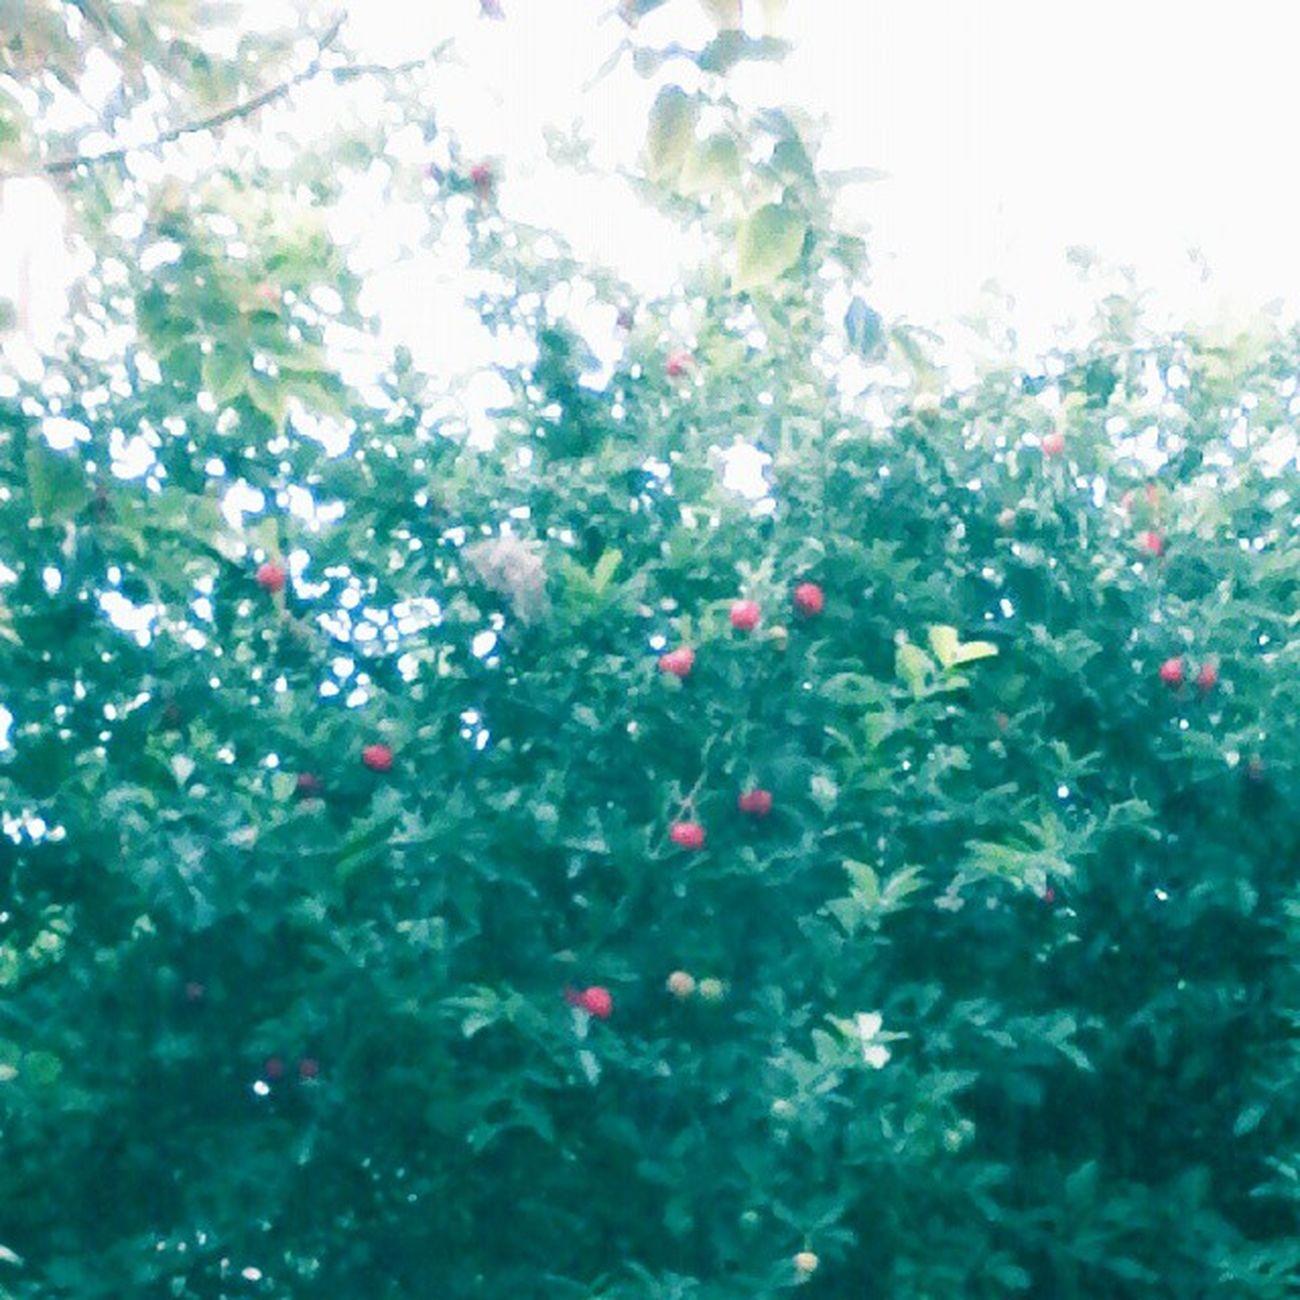 Nascendo Acerolas no Quintal muita Vitaminac 🌱🍃